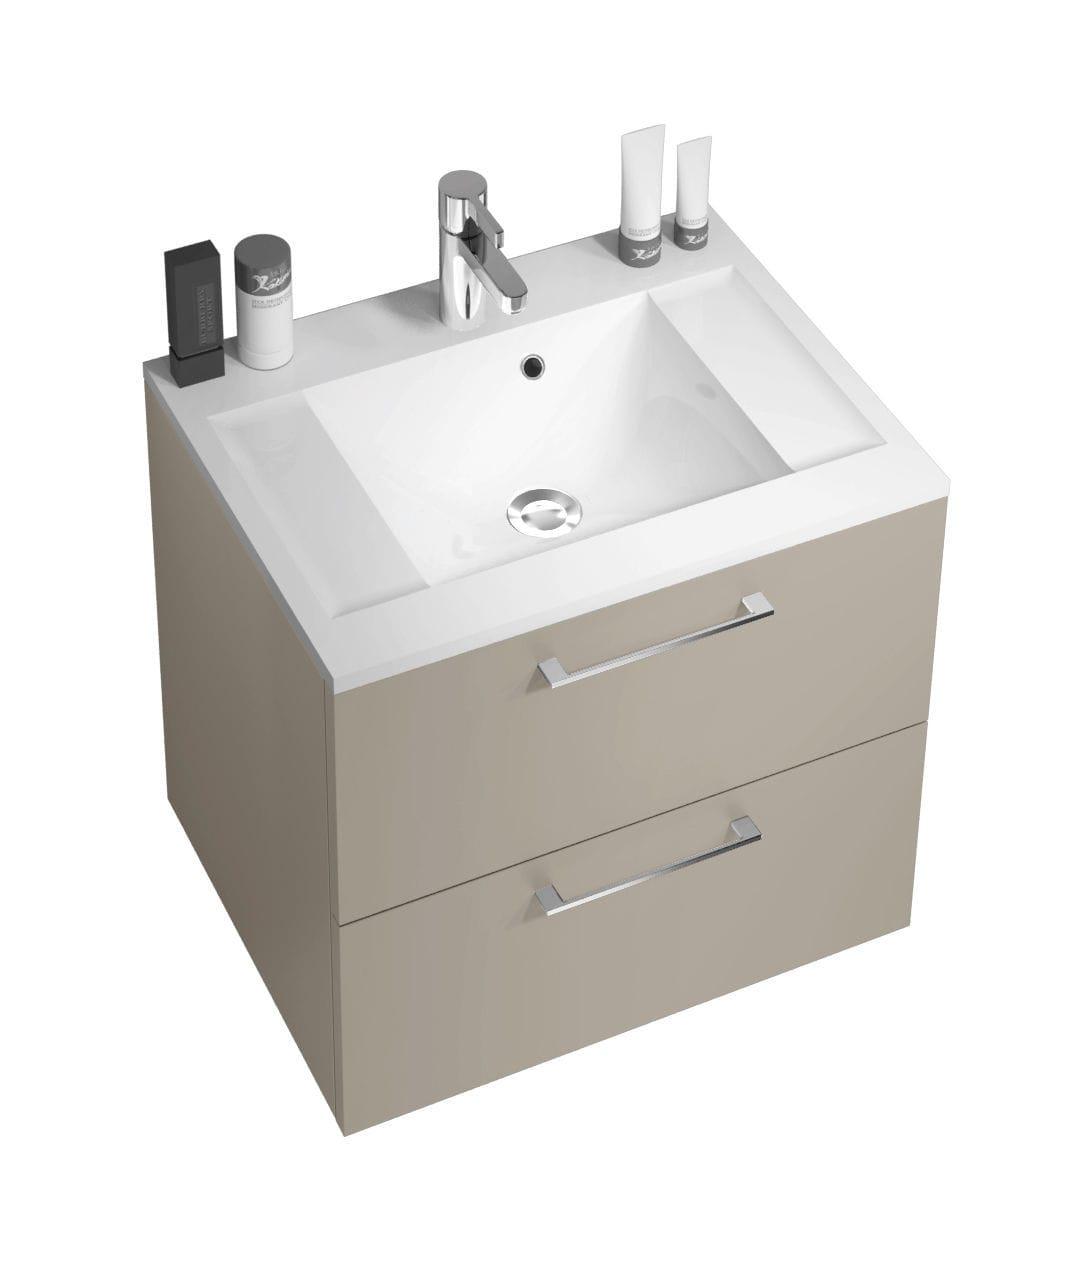 Meuble Salle De Bain Delpha Urban Pro ~ meuble vasque suspendu en m lamin classique urban pro